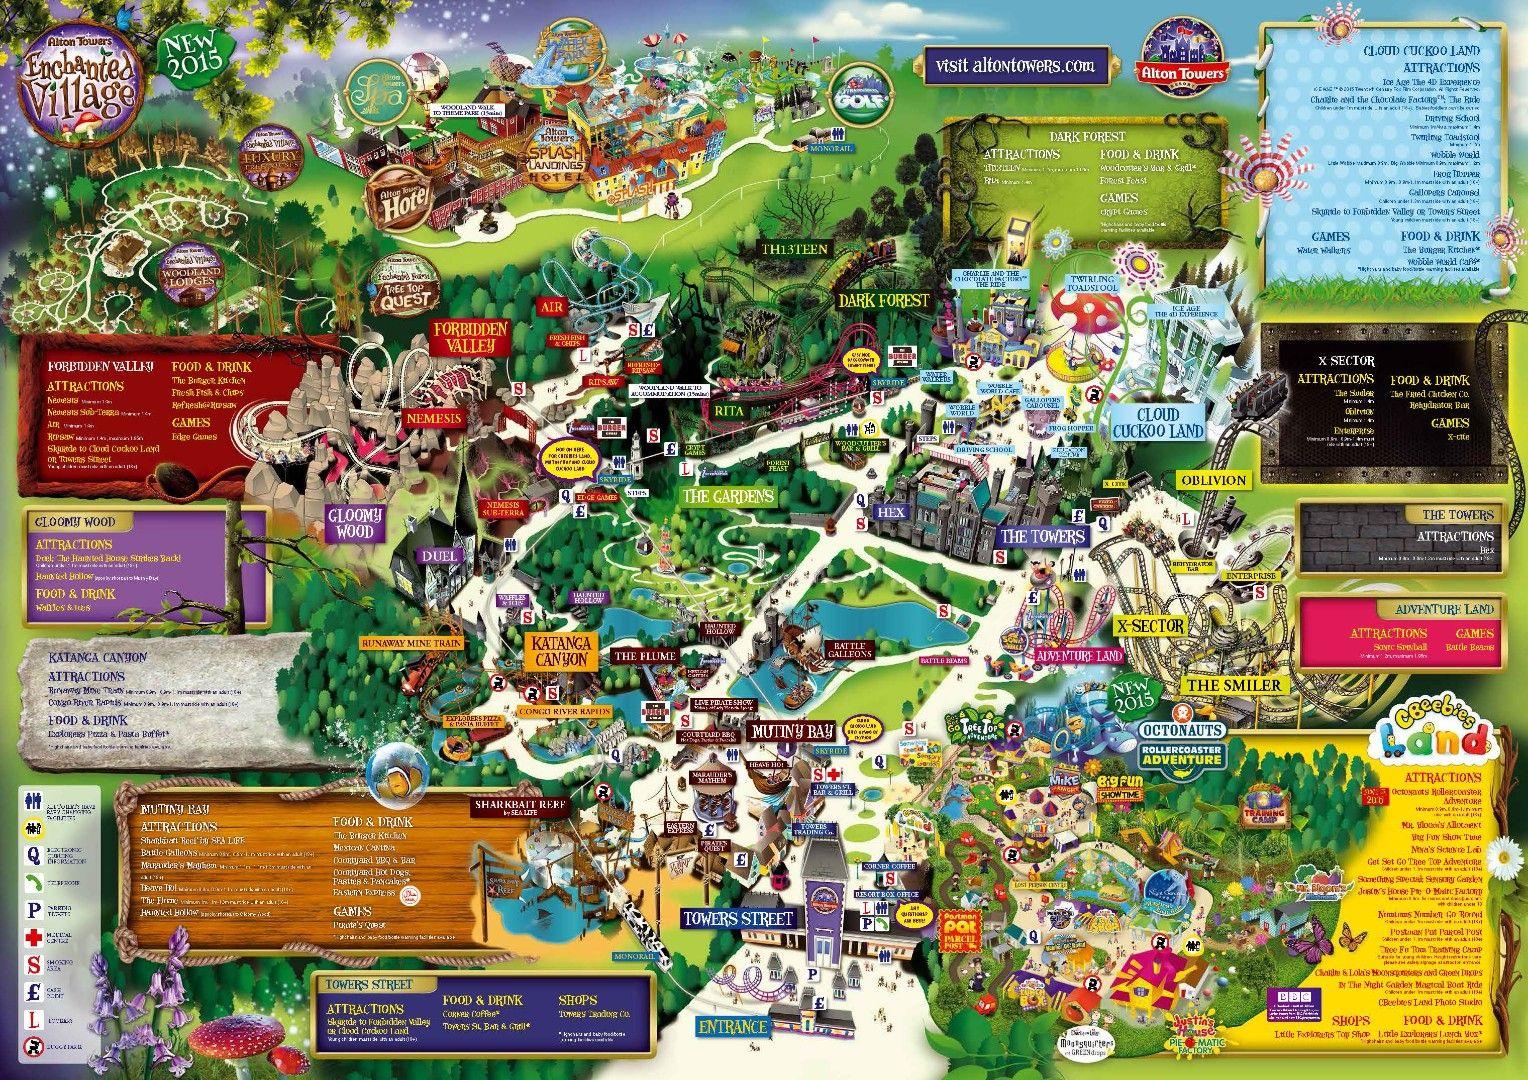 Http www alton towers co uk pages theme park - Alton Towers Is A Theme Park In The County Of Staffordshire United Kingdom It